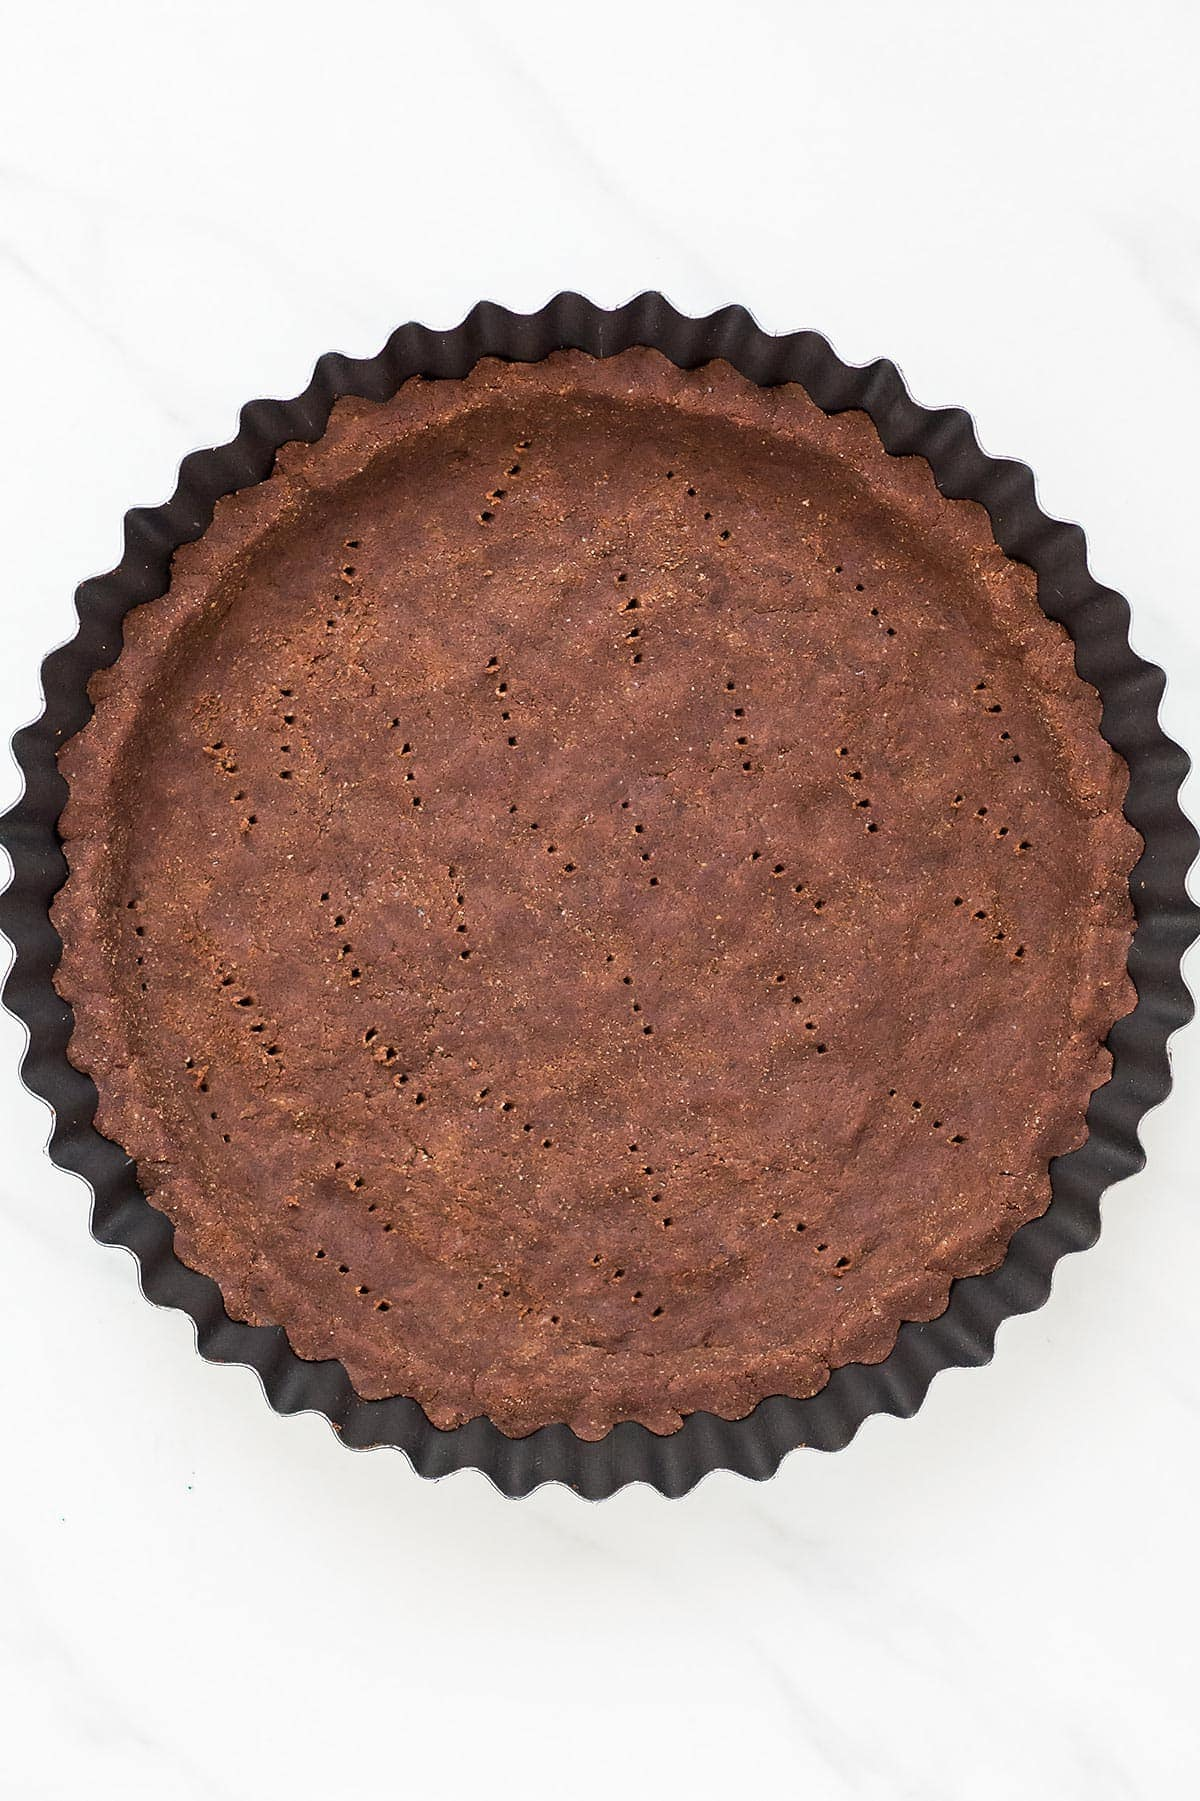 Coconut Flour Chocolate Pie Crust